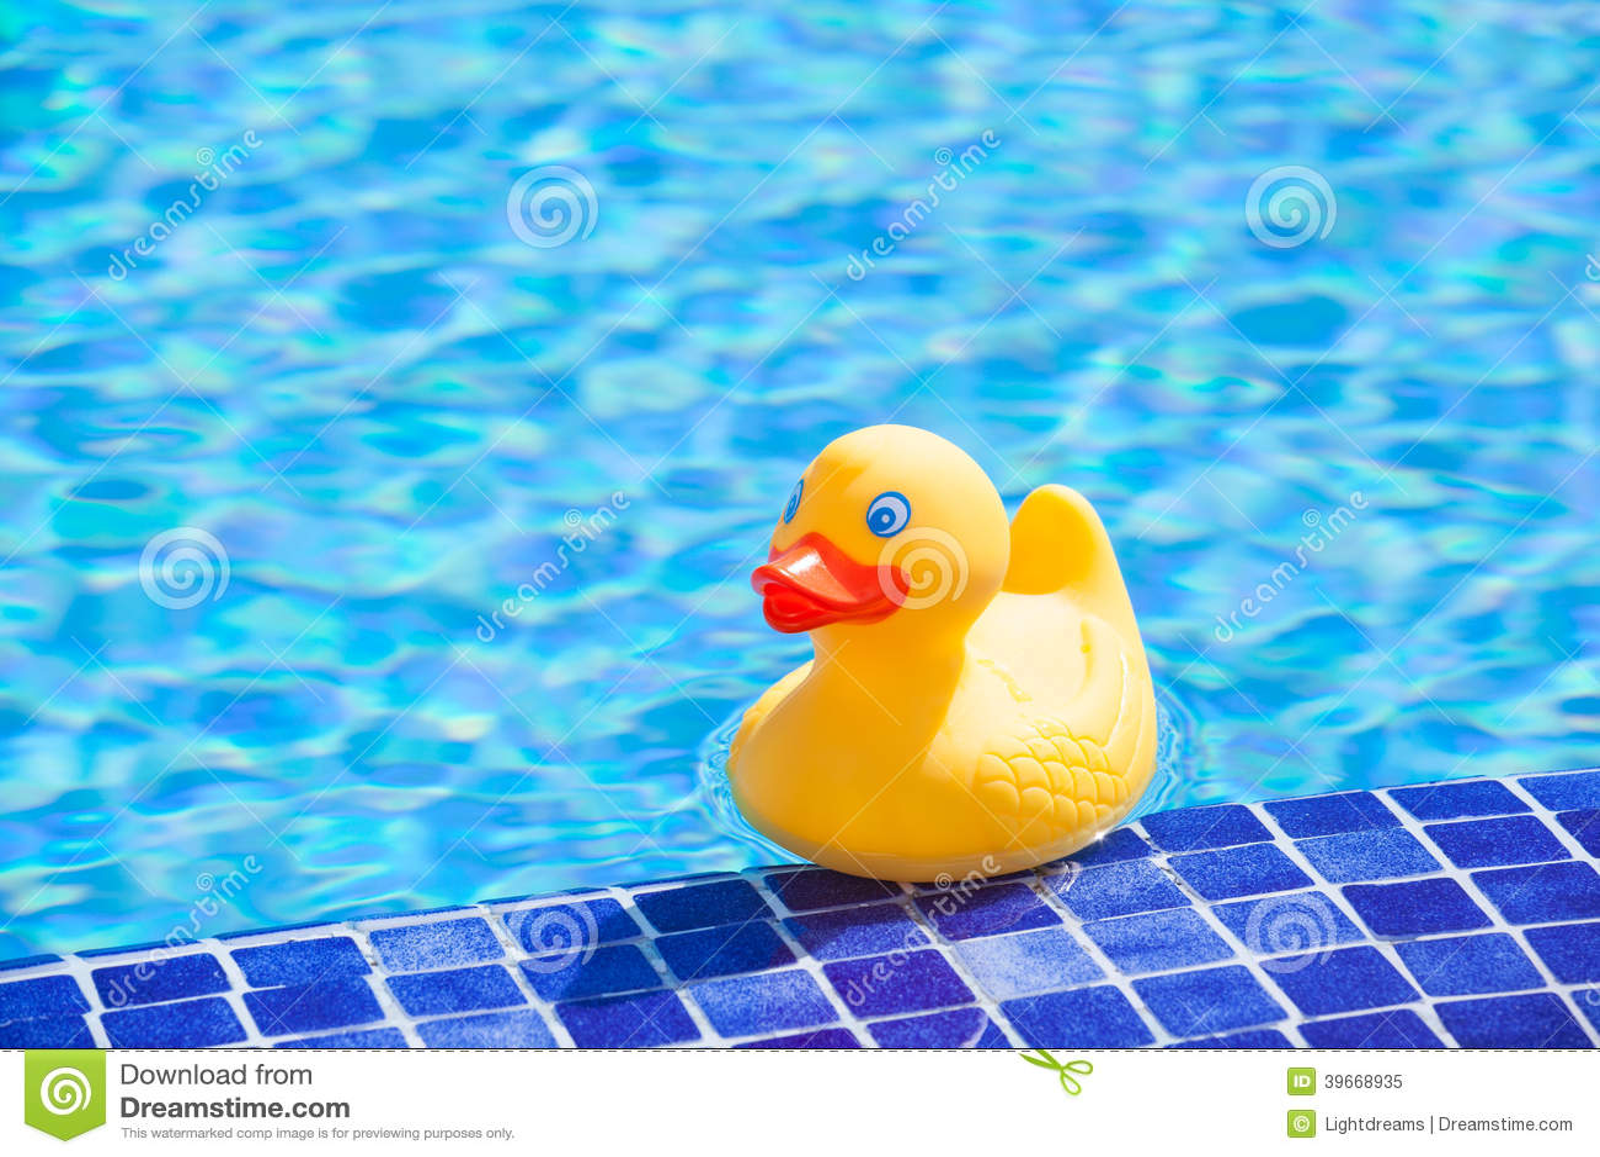 Cute Duckling Wallpaper Little Yellow Rubber Duck Stock Photo Image 39668935